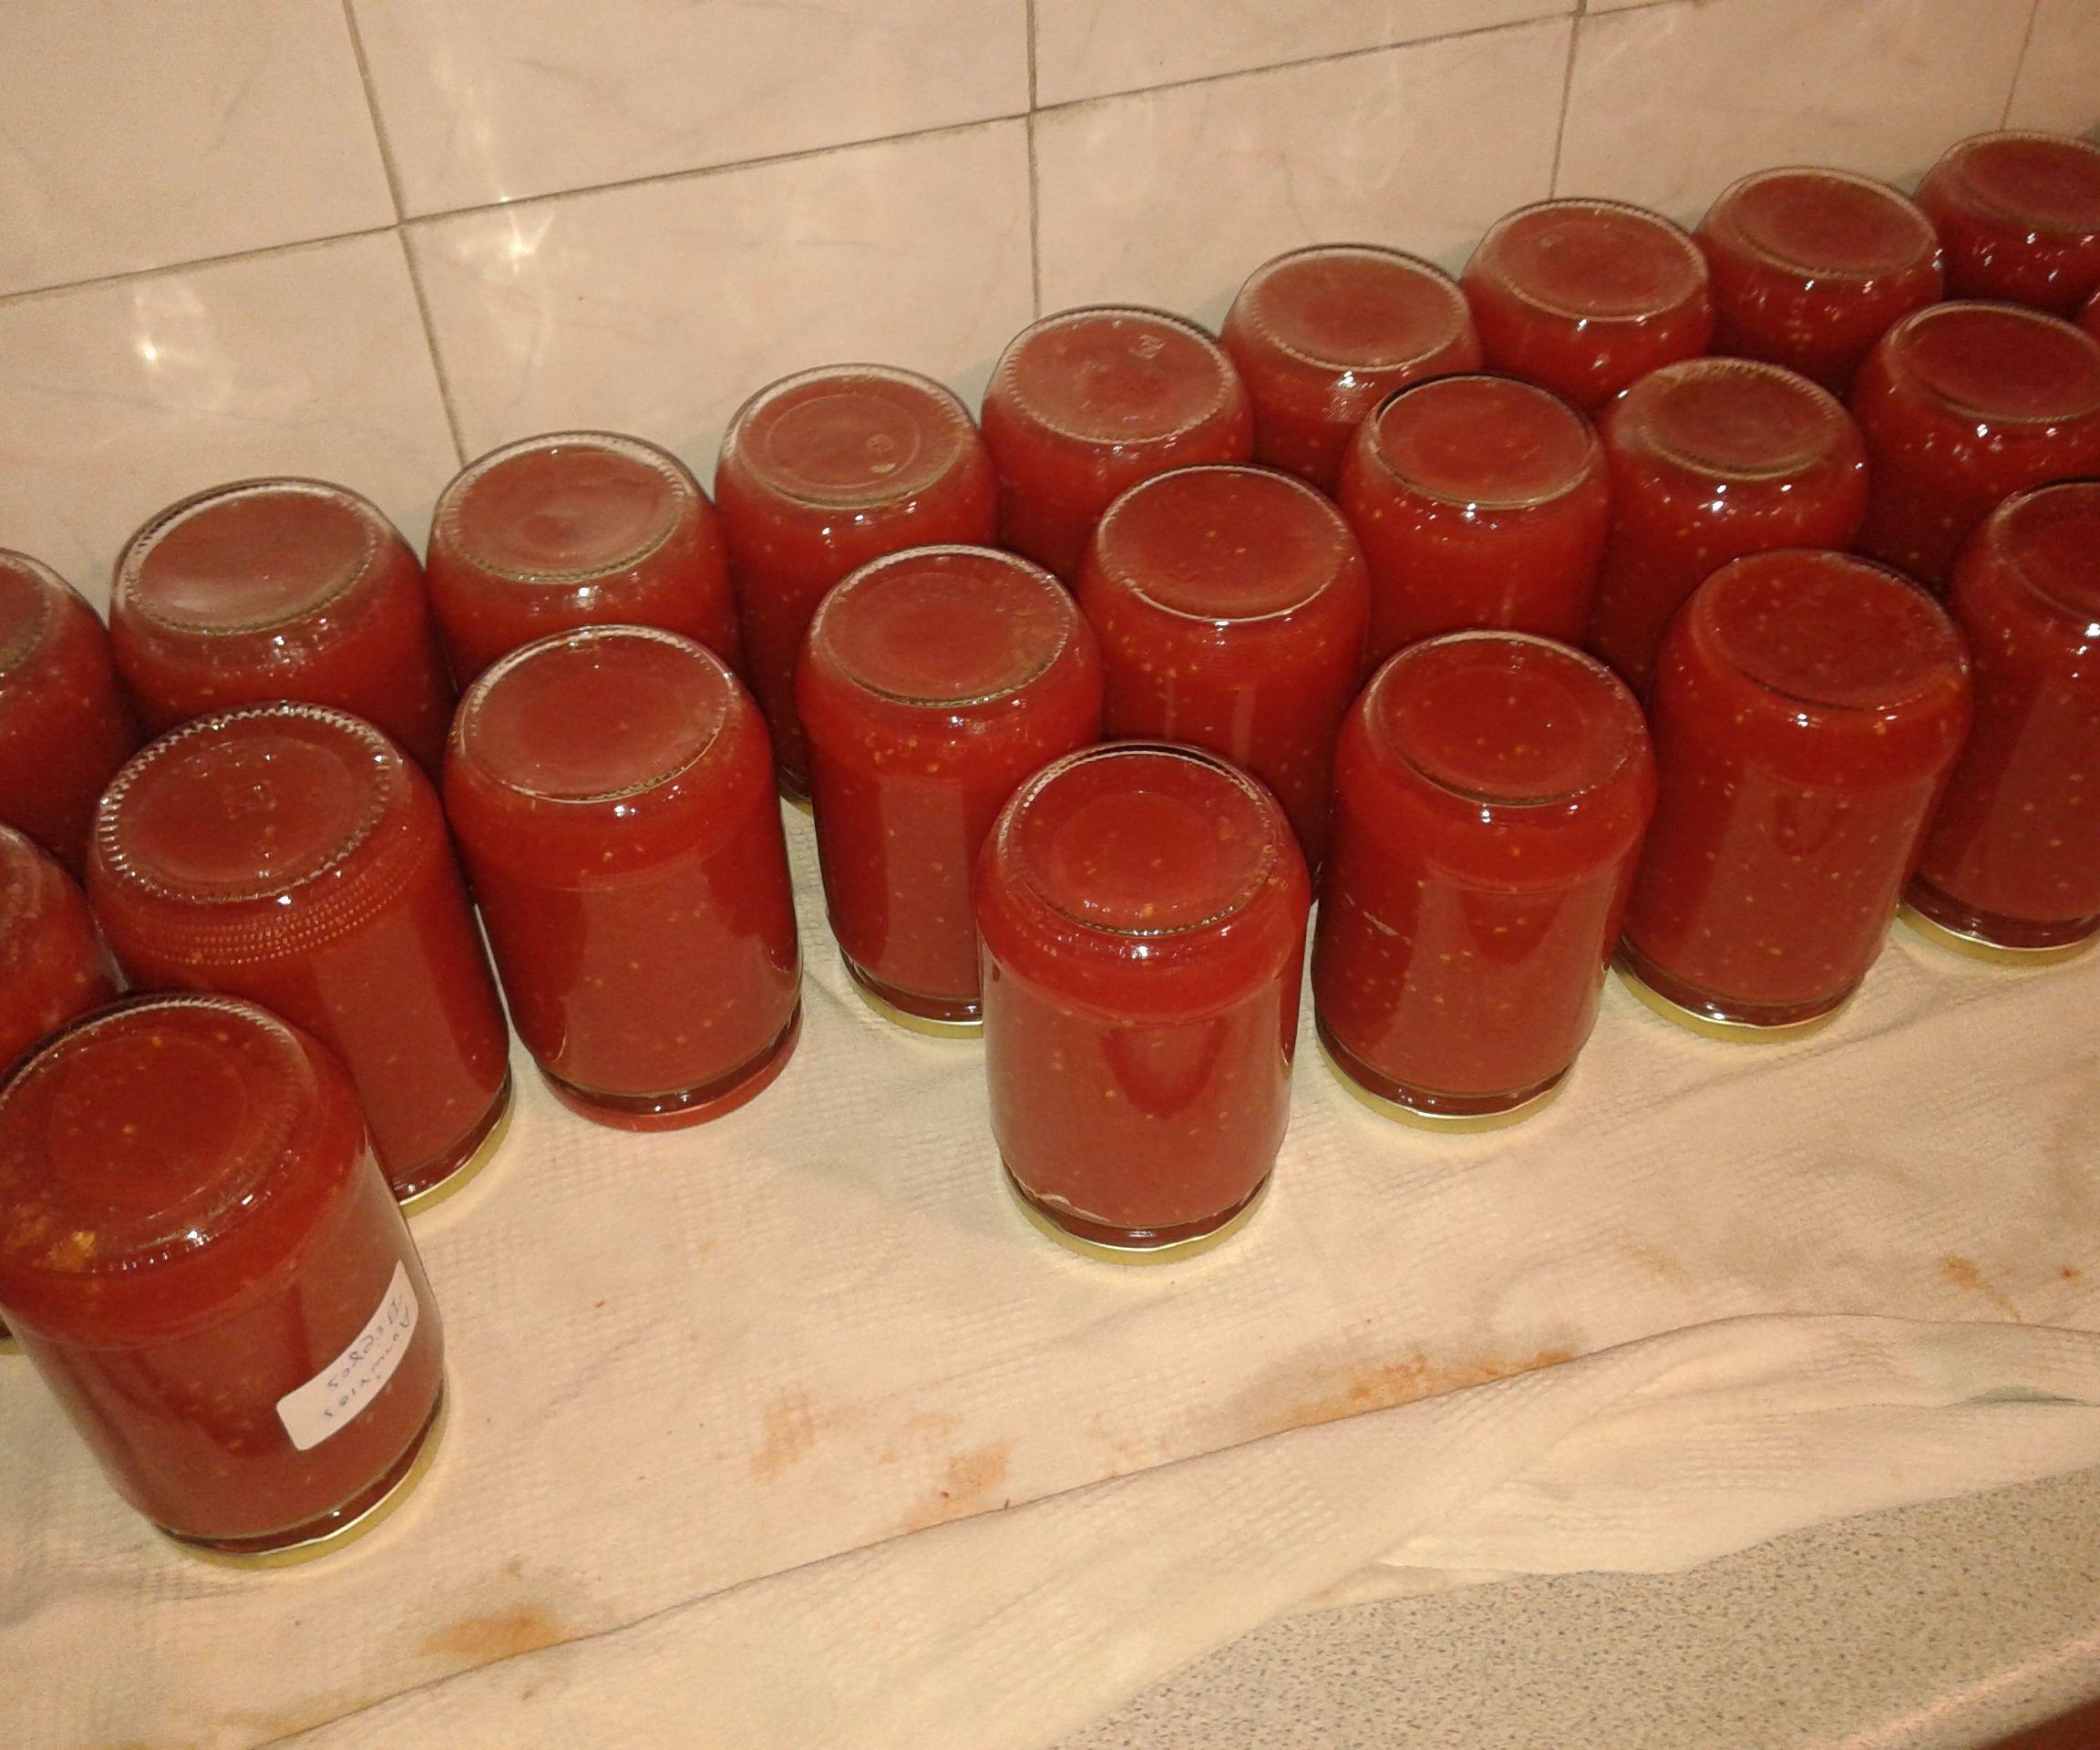 My Granny's Homemade Tomato Sauce